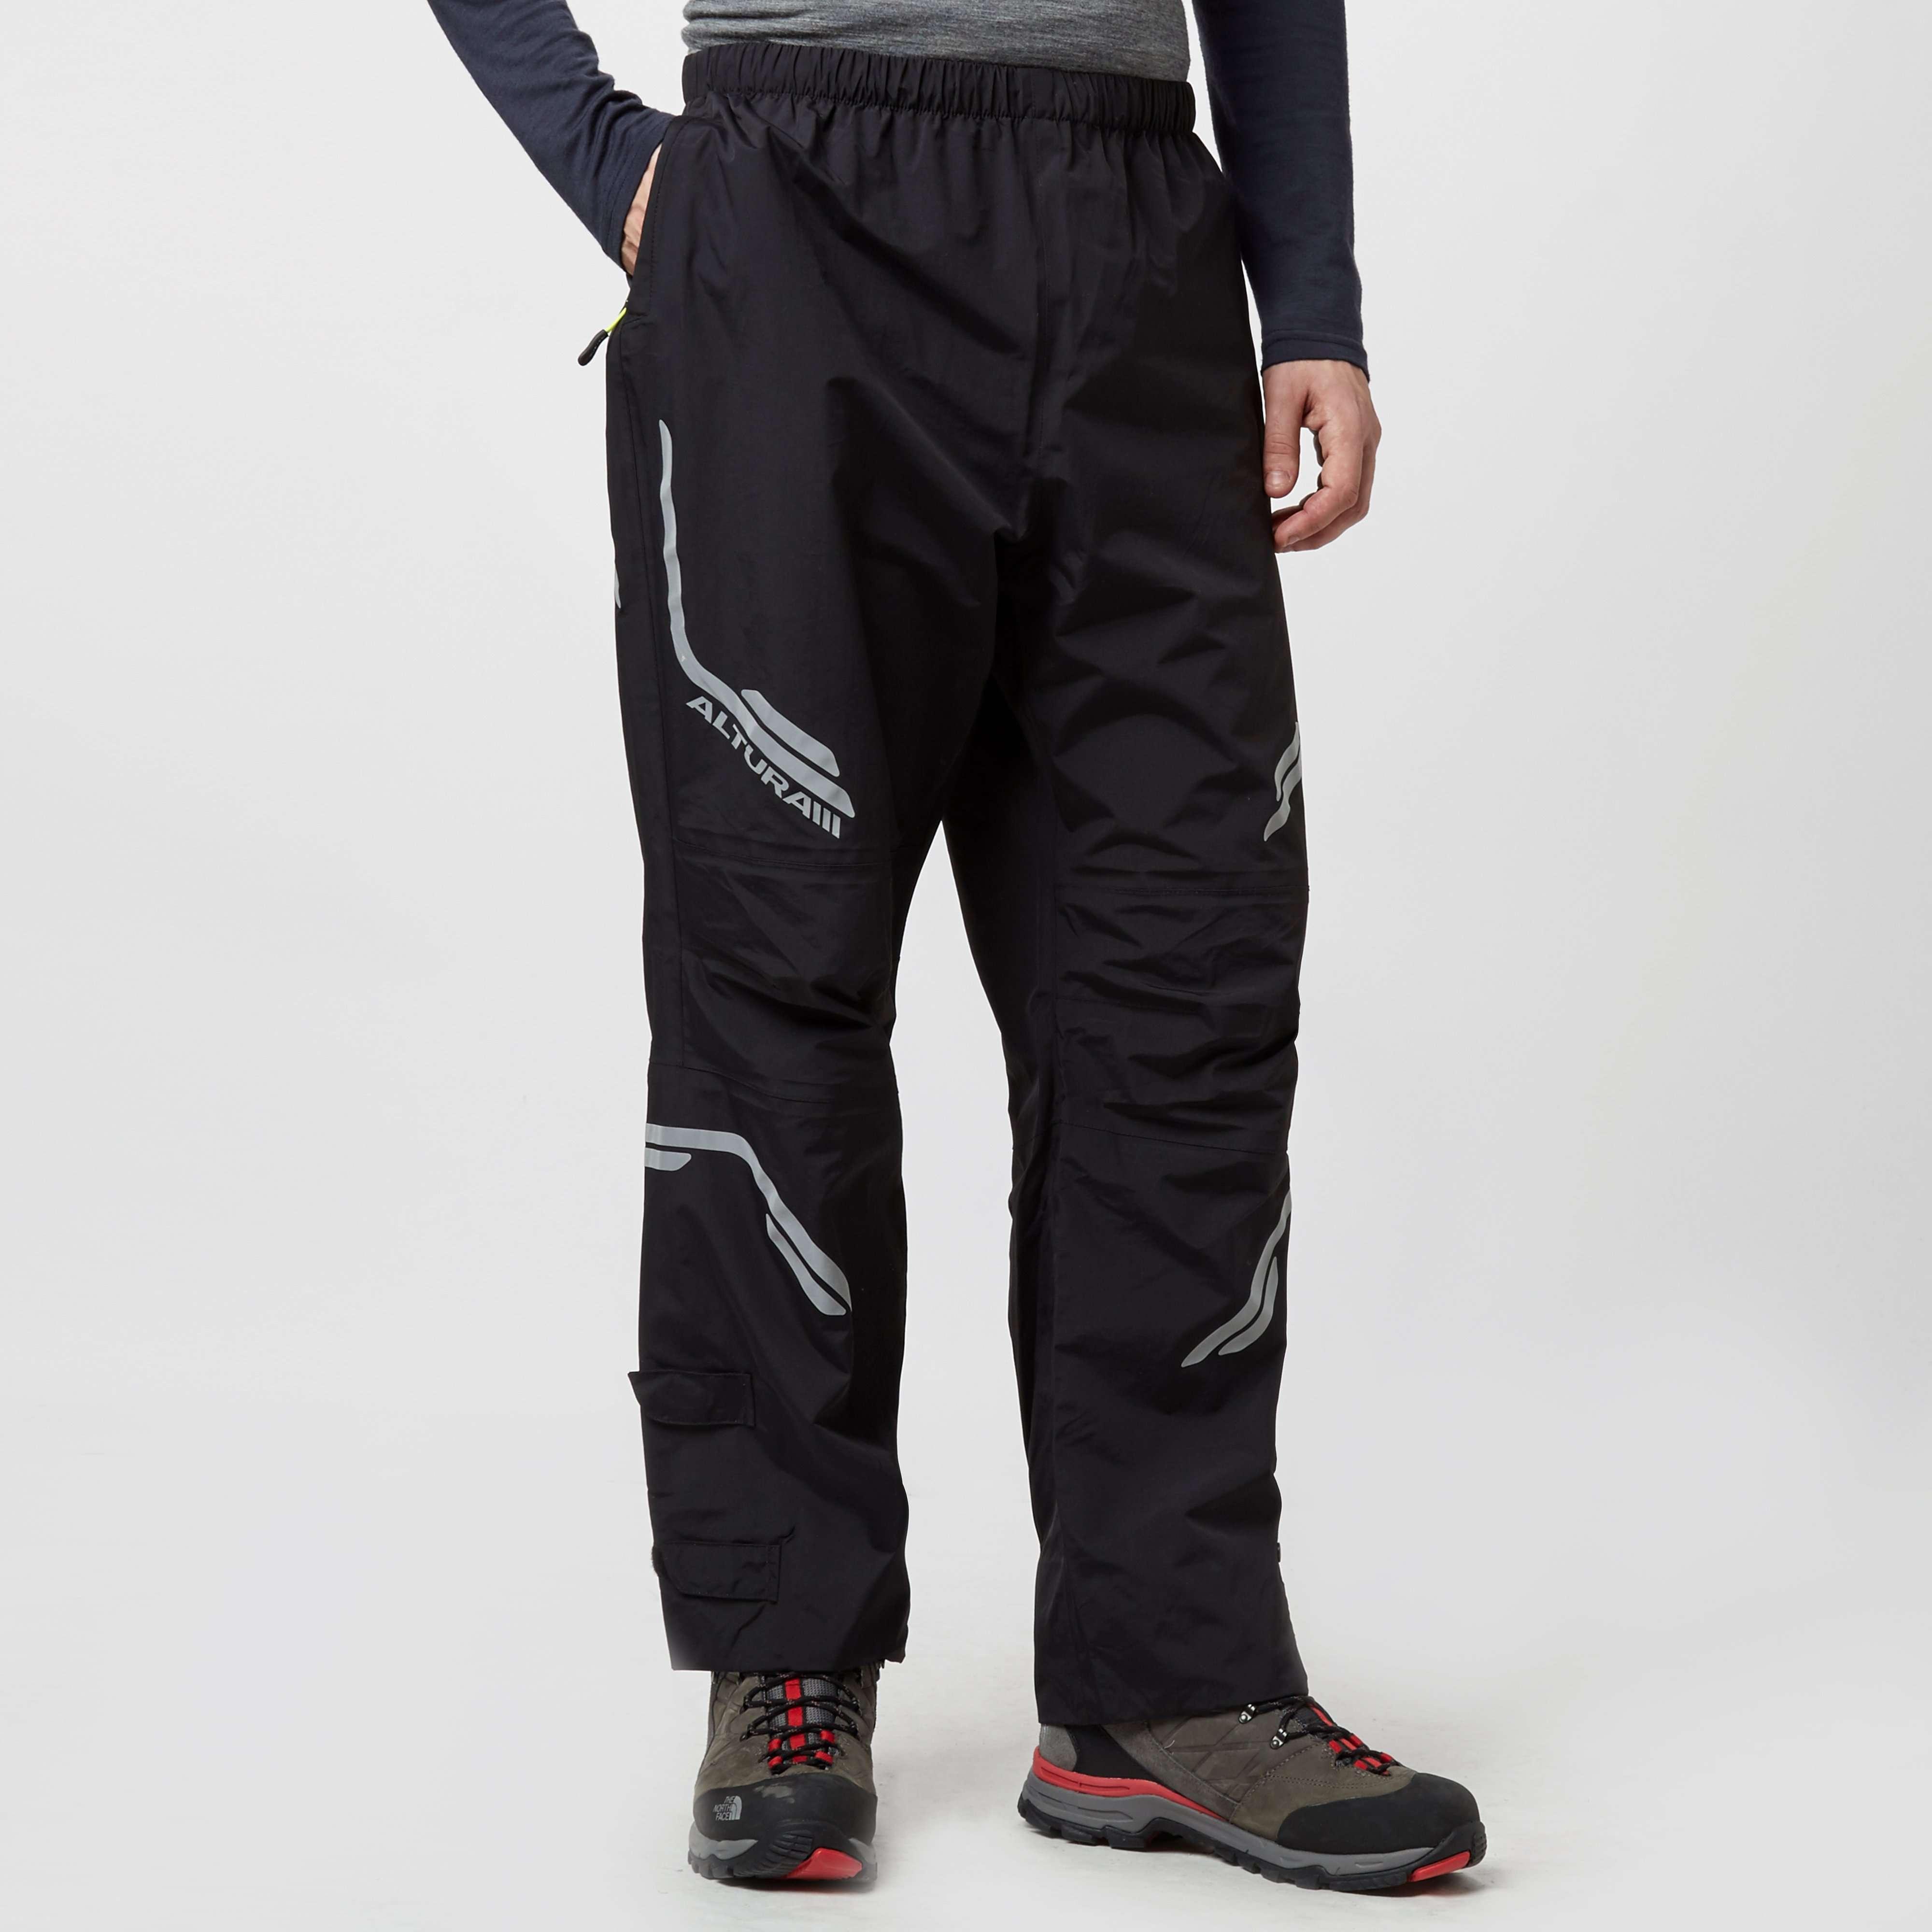 ALTURA Men's NightVision Waterproof Trousers